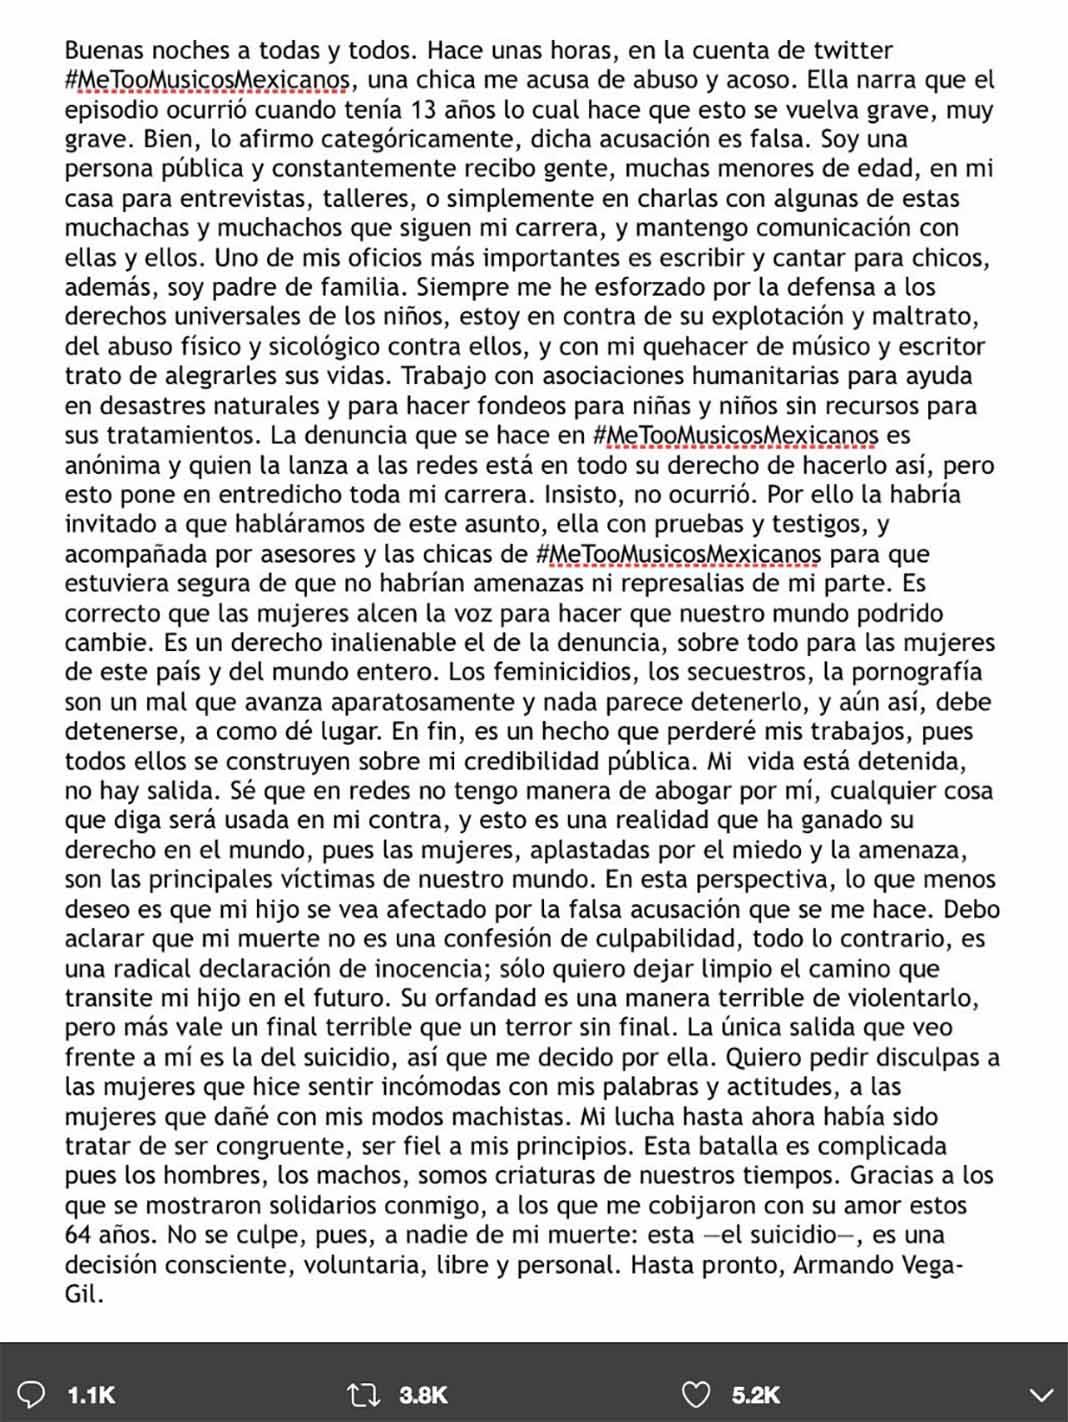 Esta es la emotiva carta del integrante de Botellita de Jerez